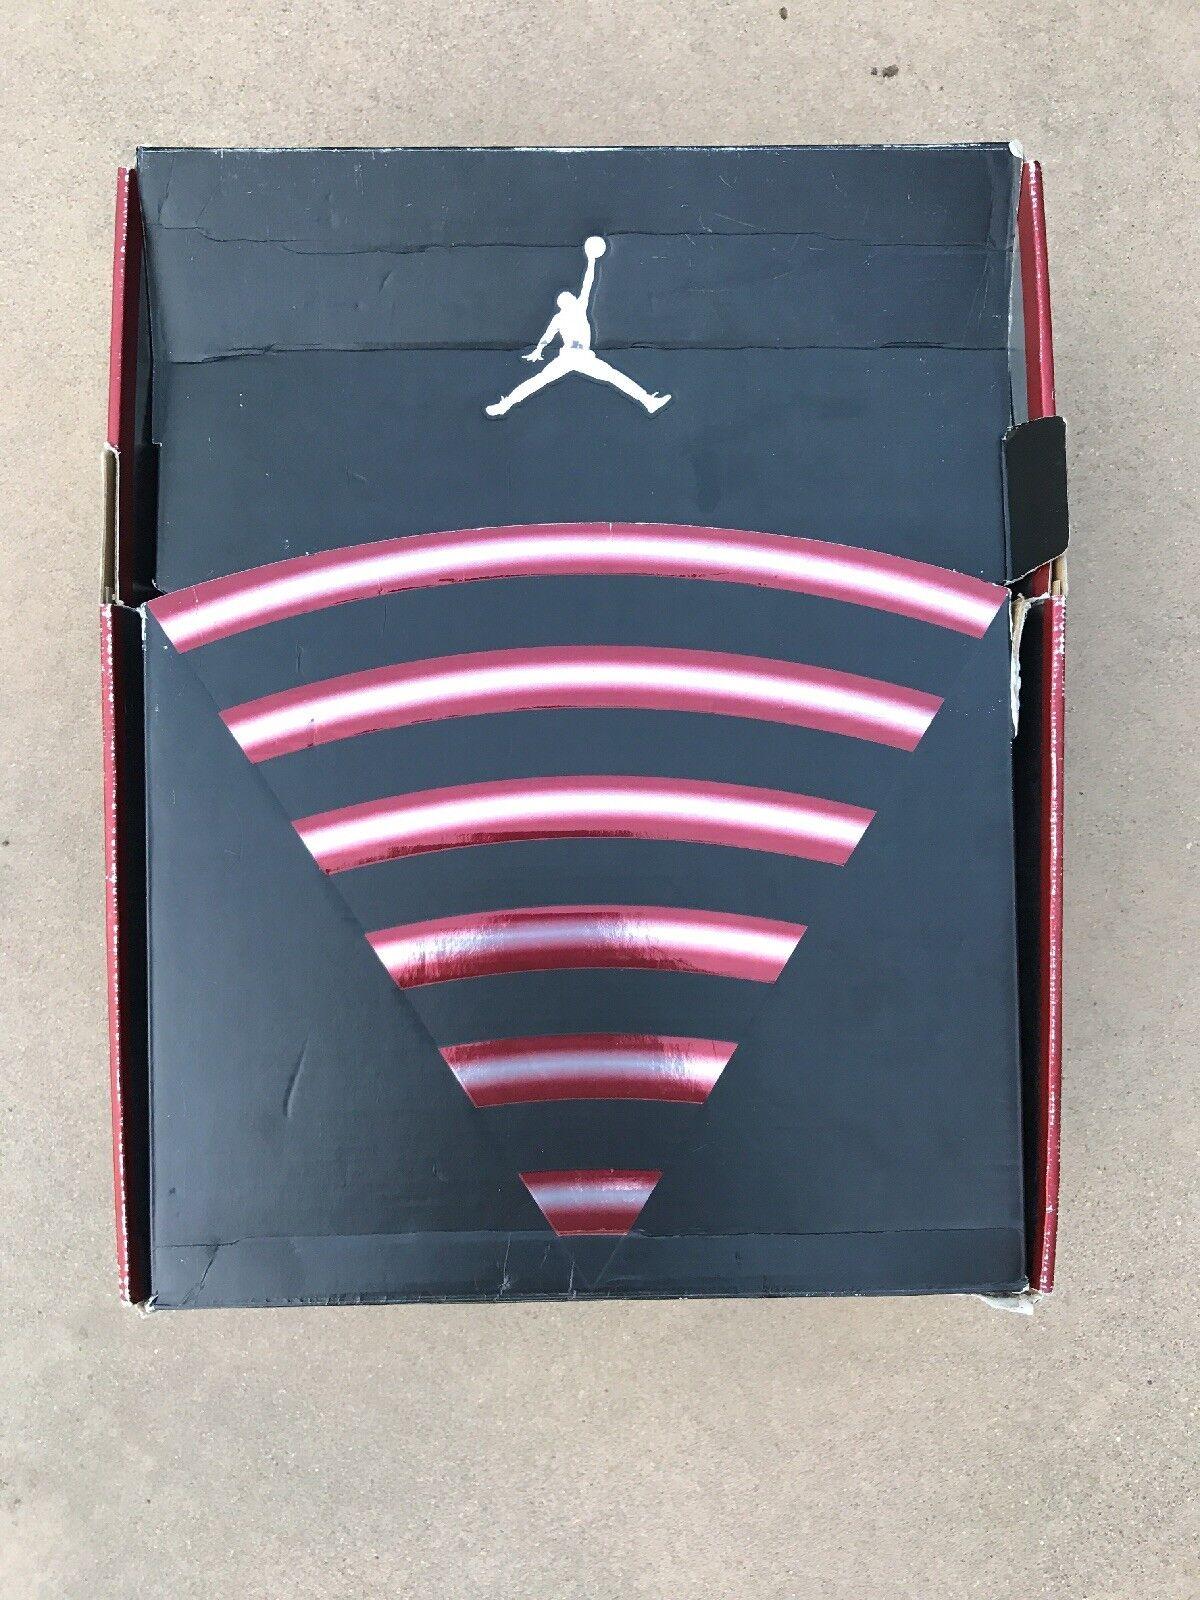 d1b4684eaac Air Jordan 20 Stealth - 310455 002 nzygvl1868-Athletic Shoes - www ...